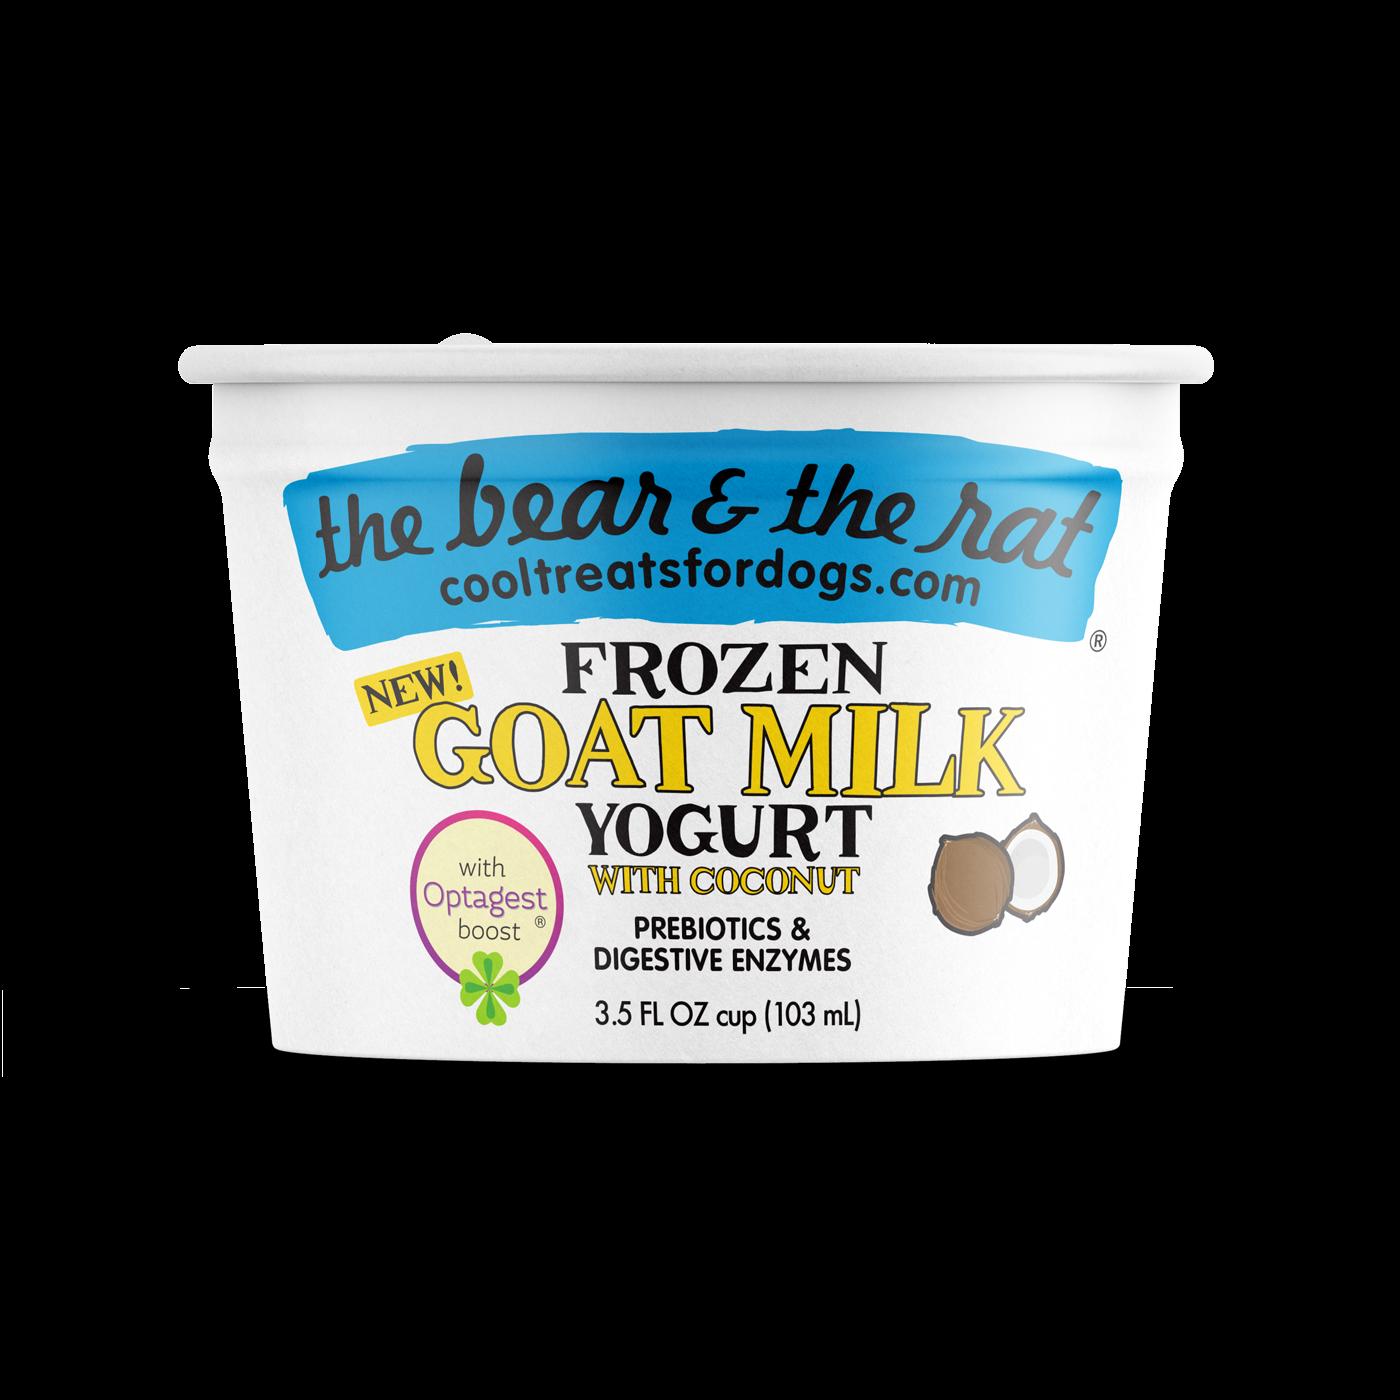 The Bear & The Rat Coconut Frozen Goat Milk Yogurt Dog Treats, 3.5-oz, Single Cup